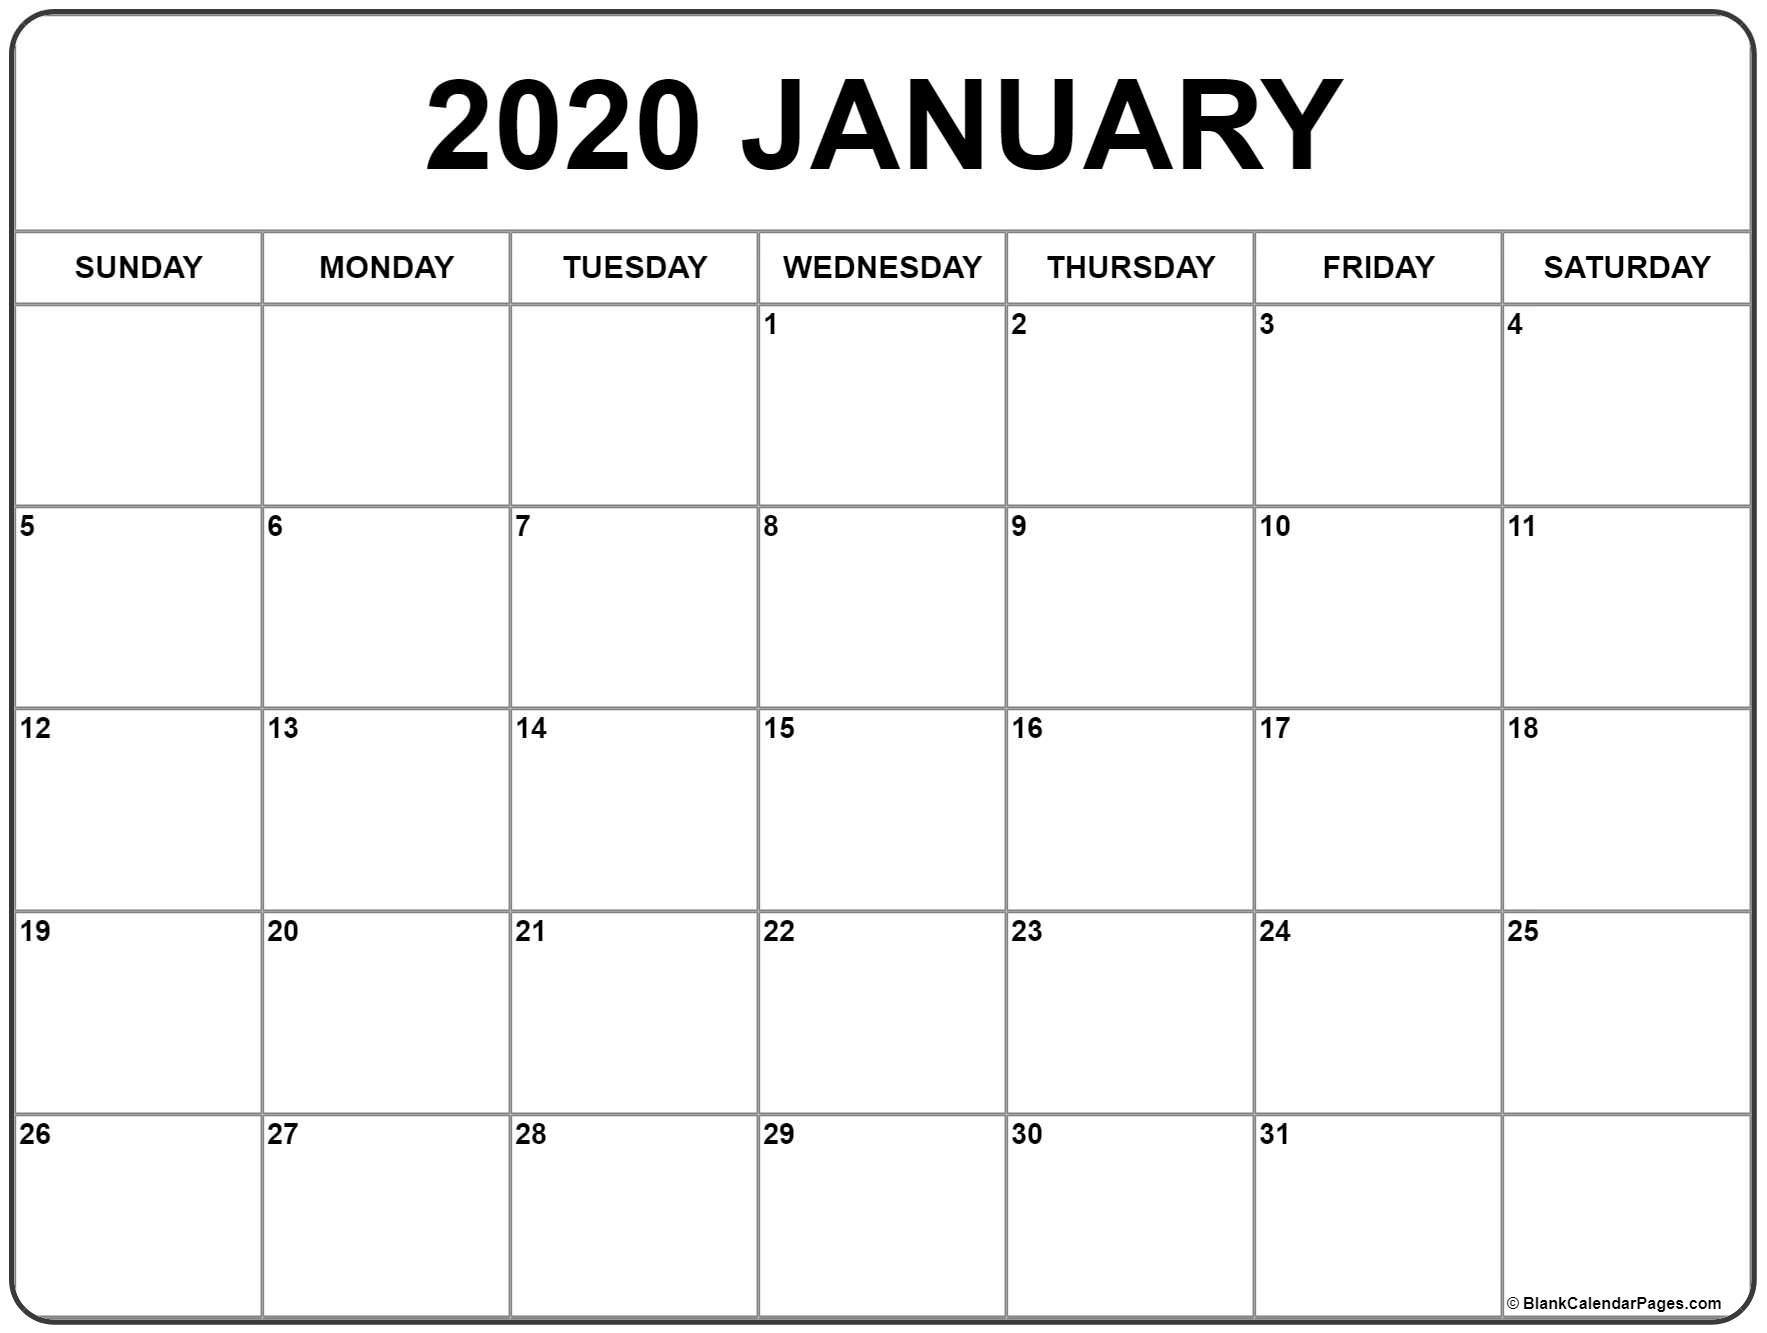 January 2020 Calendar | Free Printable Monthly Calendars in January 2020 Calendar